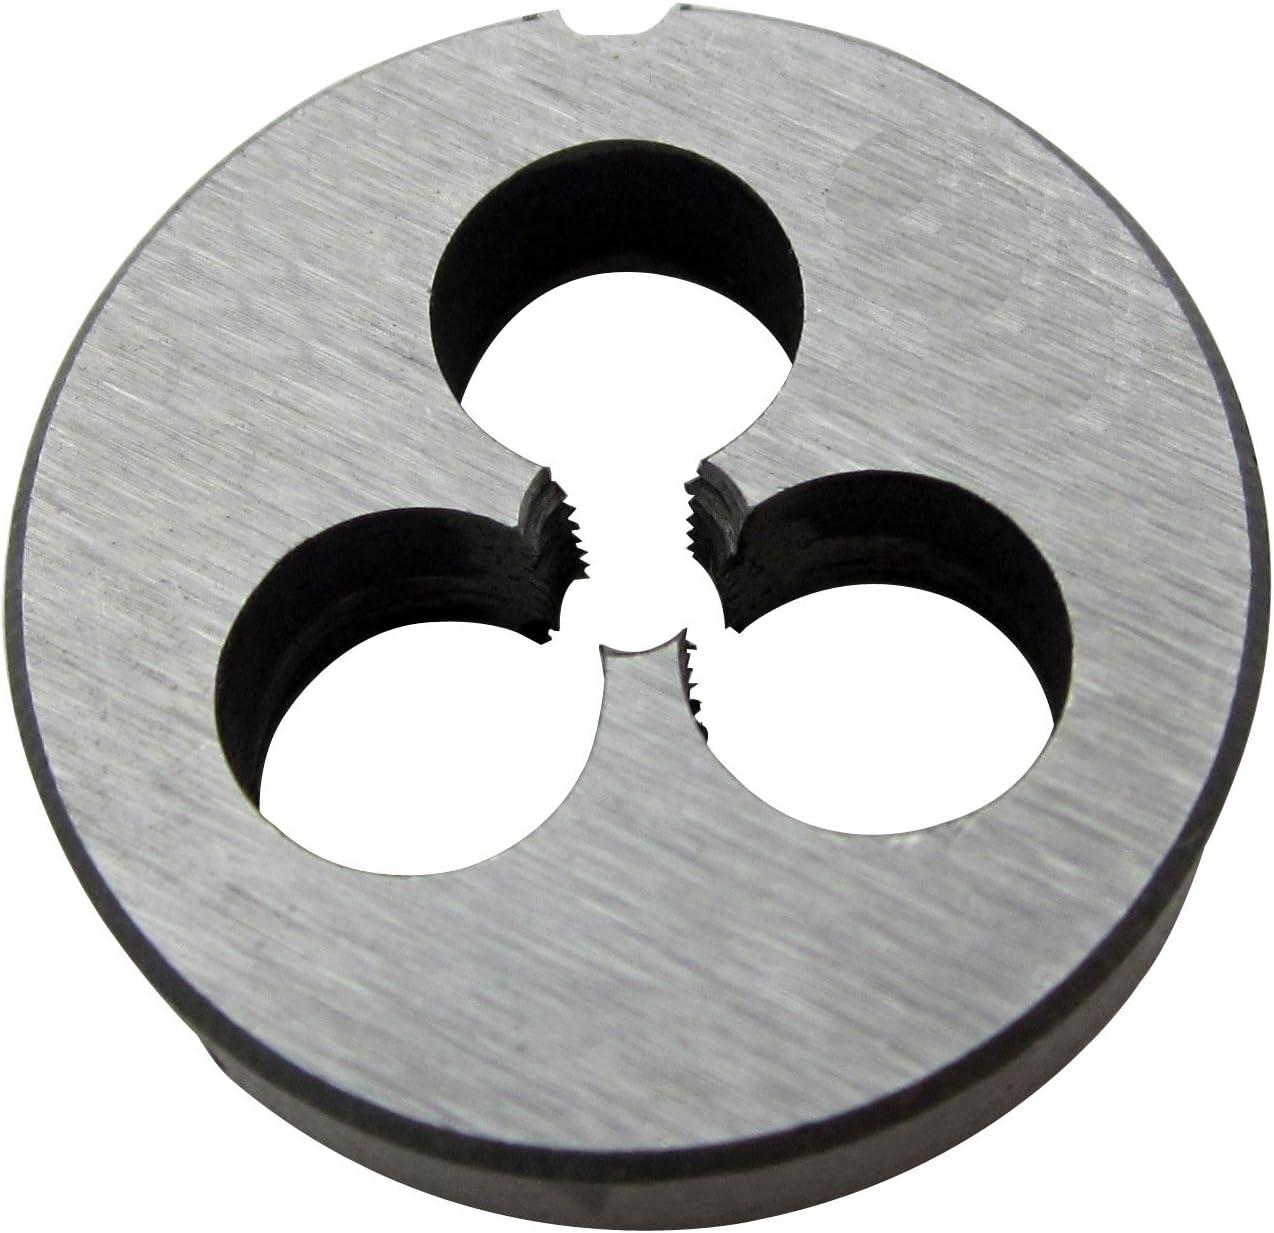 Metric Fine LH Mf M 24 x 1.5  24 mm Hand Taps Serial Form LEFT HAND